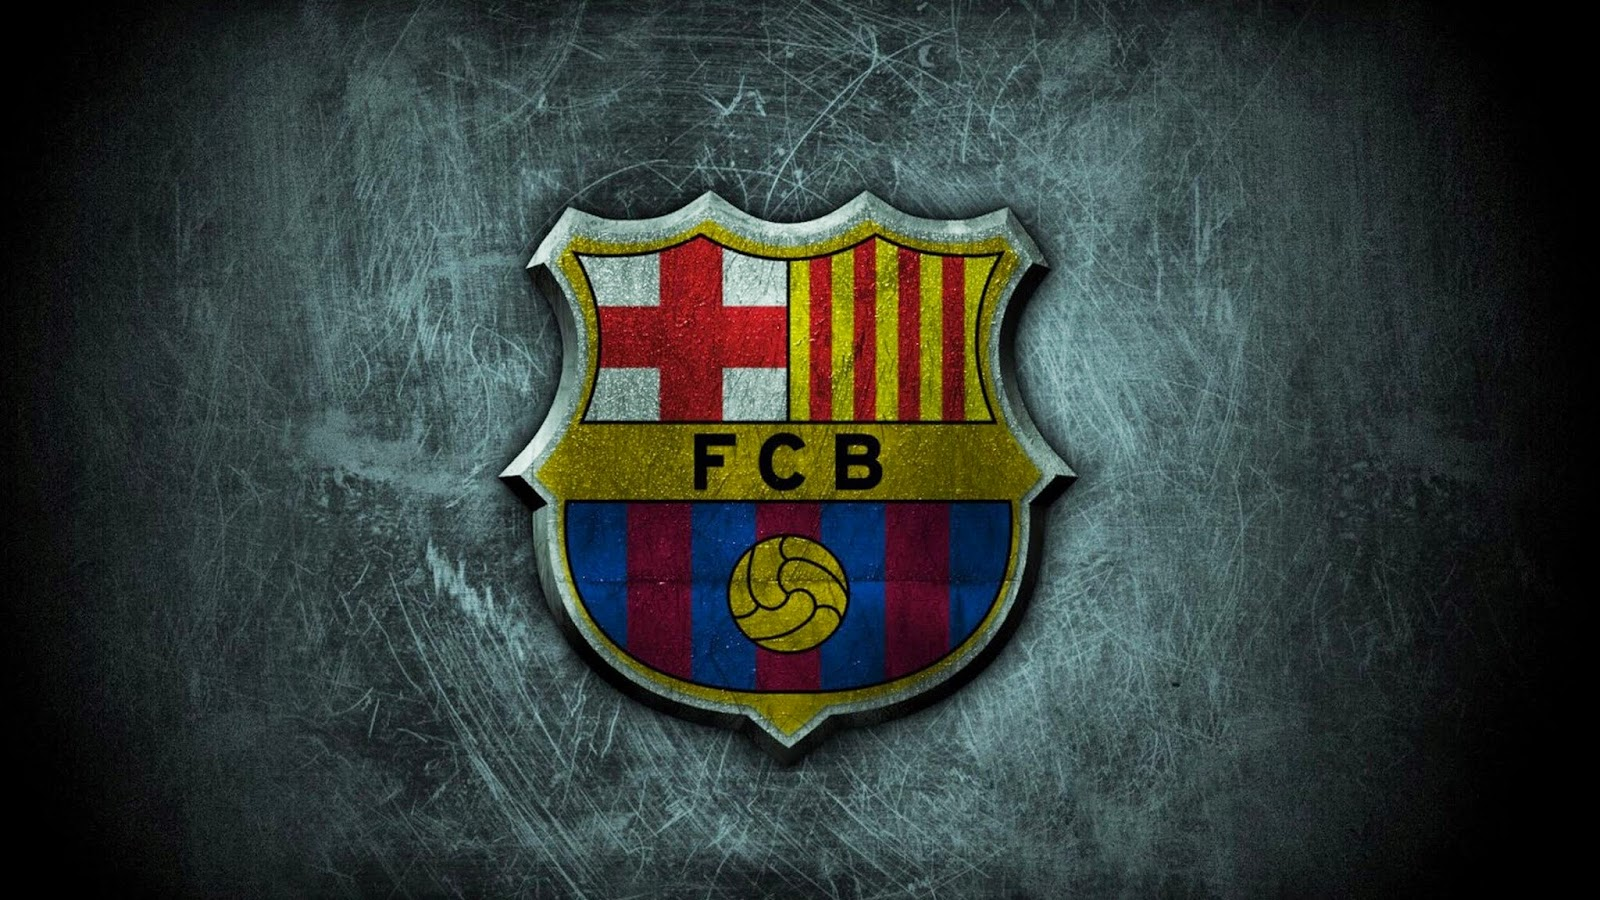 Wallpaper Keren Logo Fc Barcelona Gambar Kartun Lucu Fcb